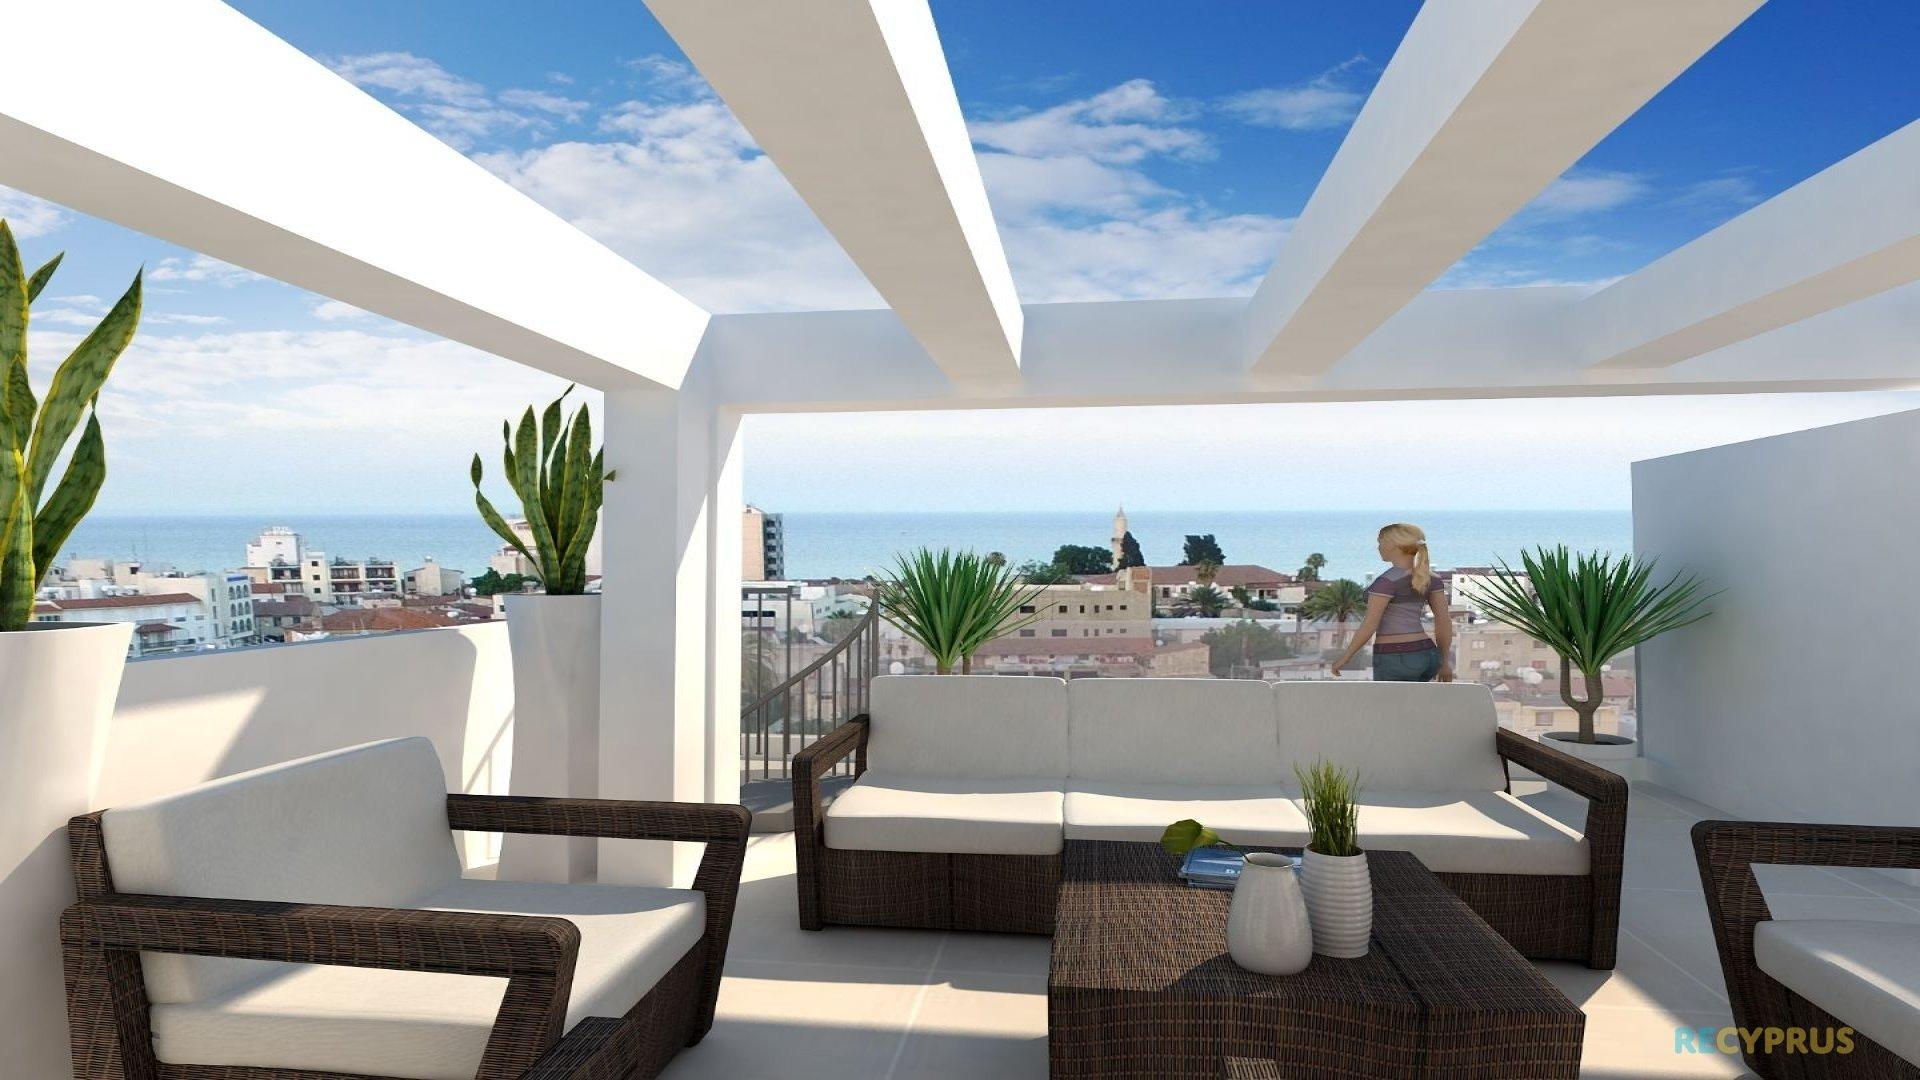 Apartment for sale City Center Larnaca Cyprus 10 3595